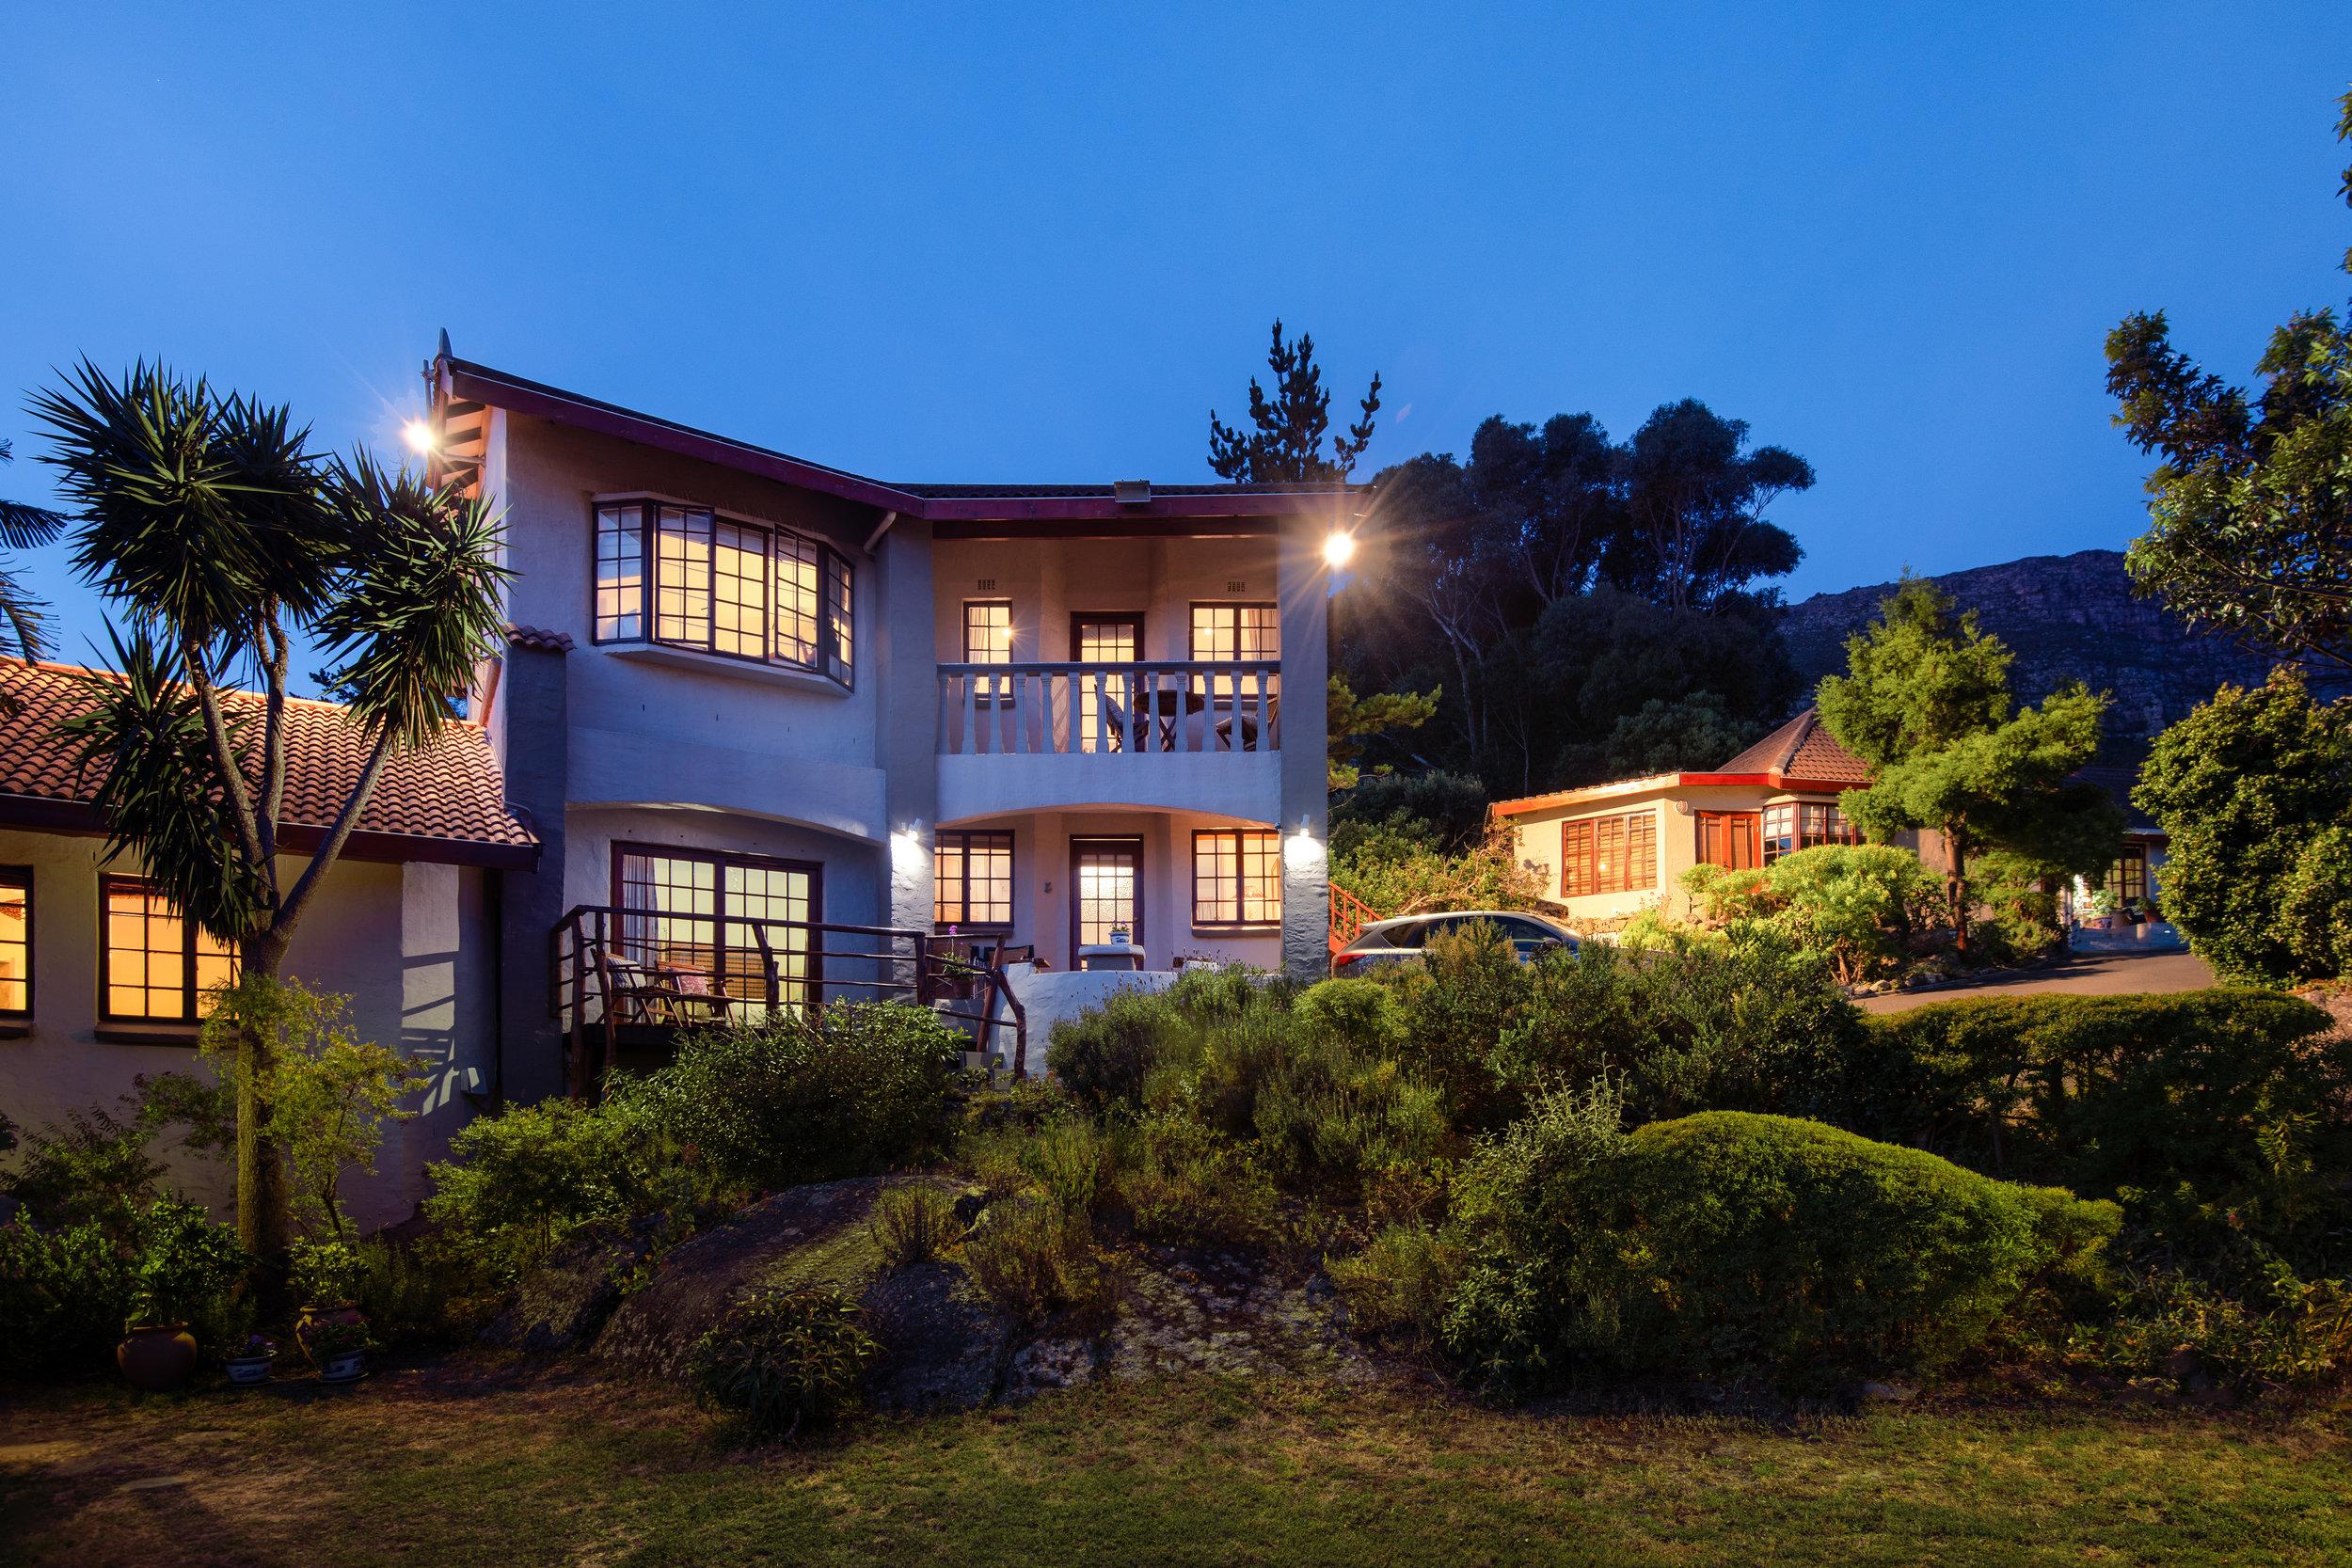 Victorskloof Lodge & Spa - 181109 - 7627.jpg